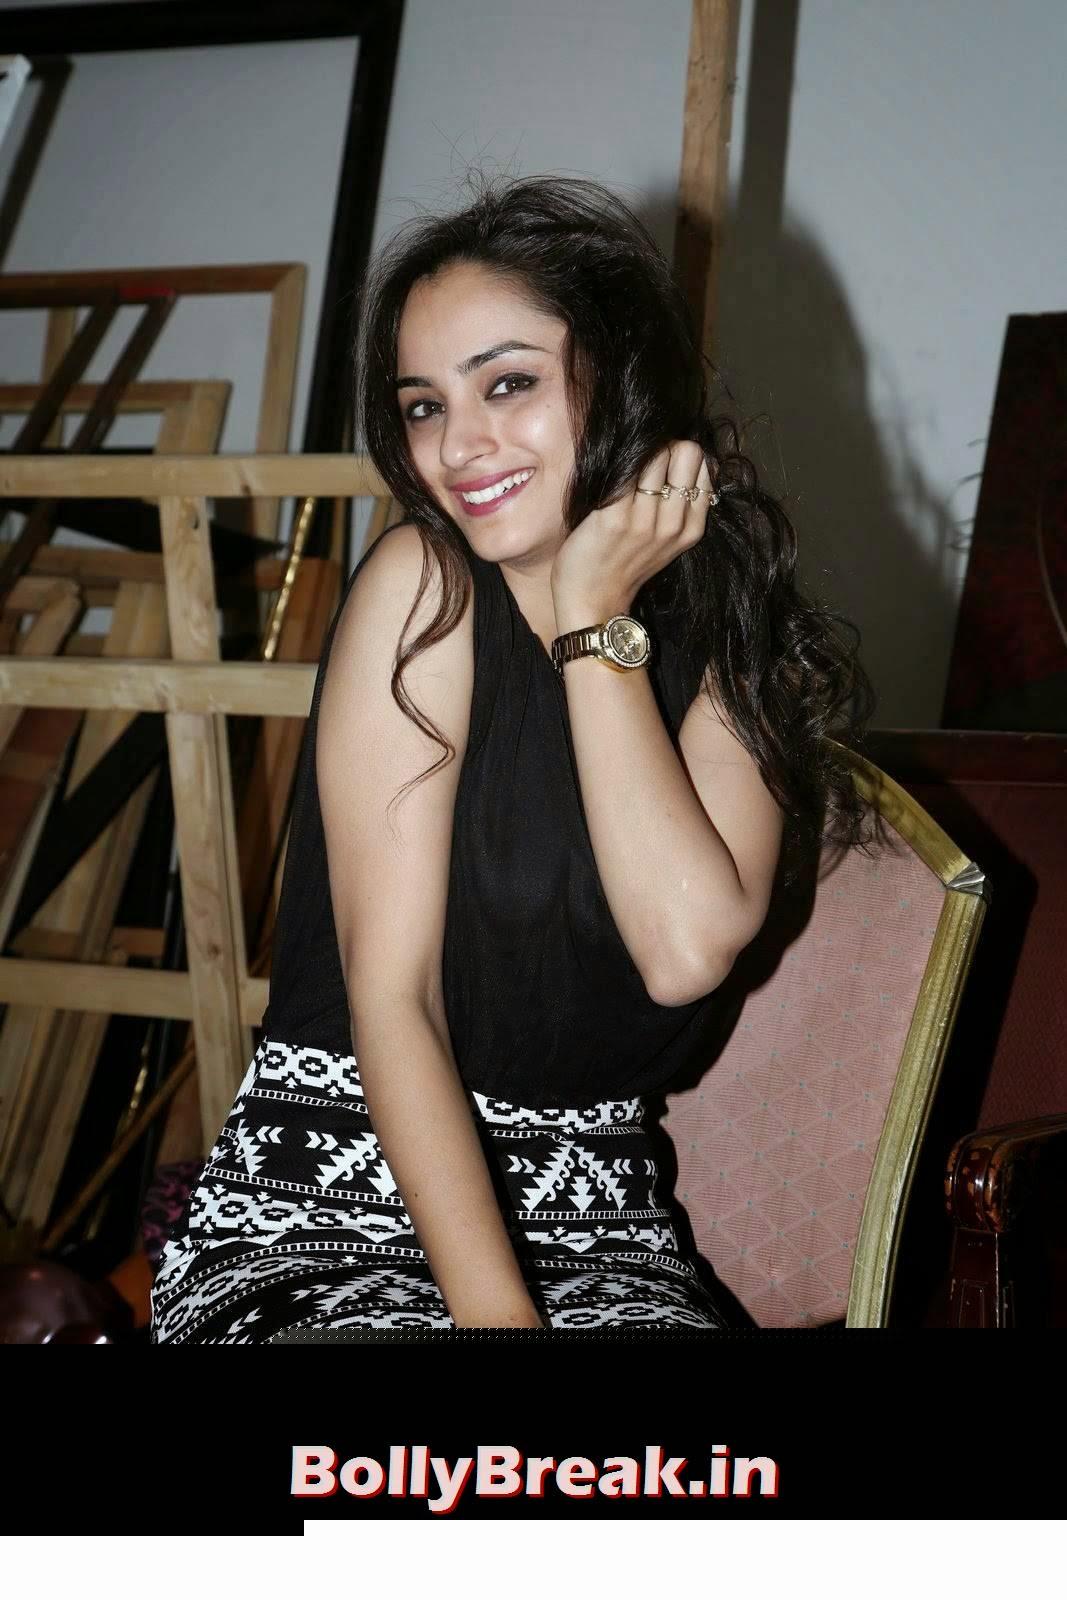 Actress Madirakshi Photoshoot Stills, Actress Madirakshi Hot Pics in Skirt & Black Top